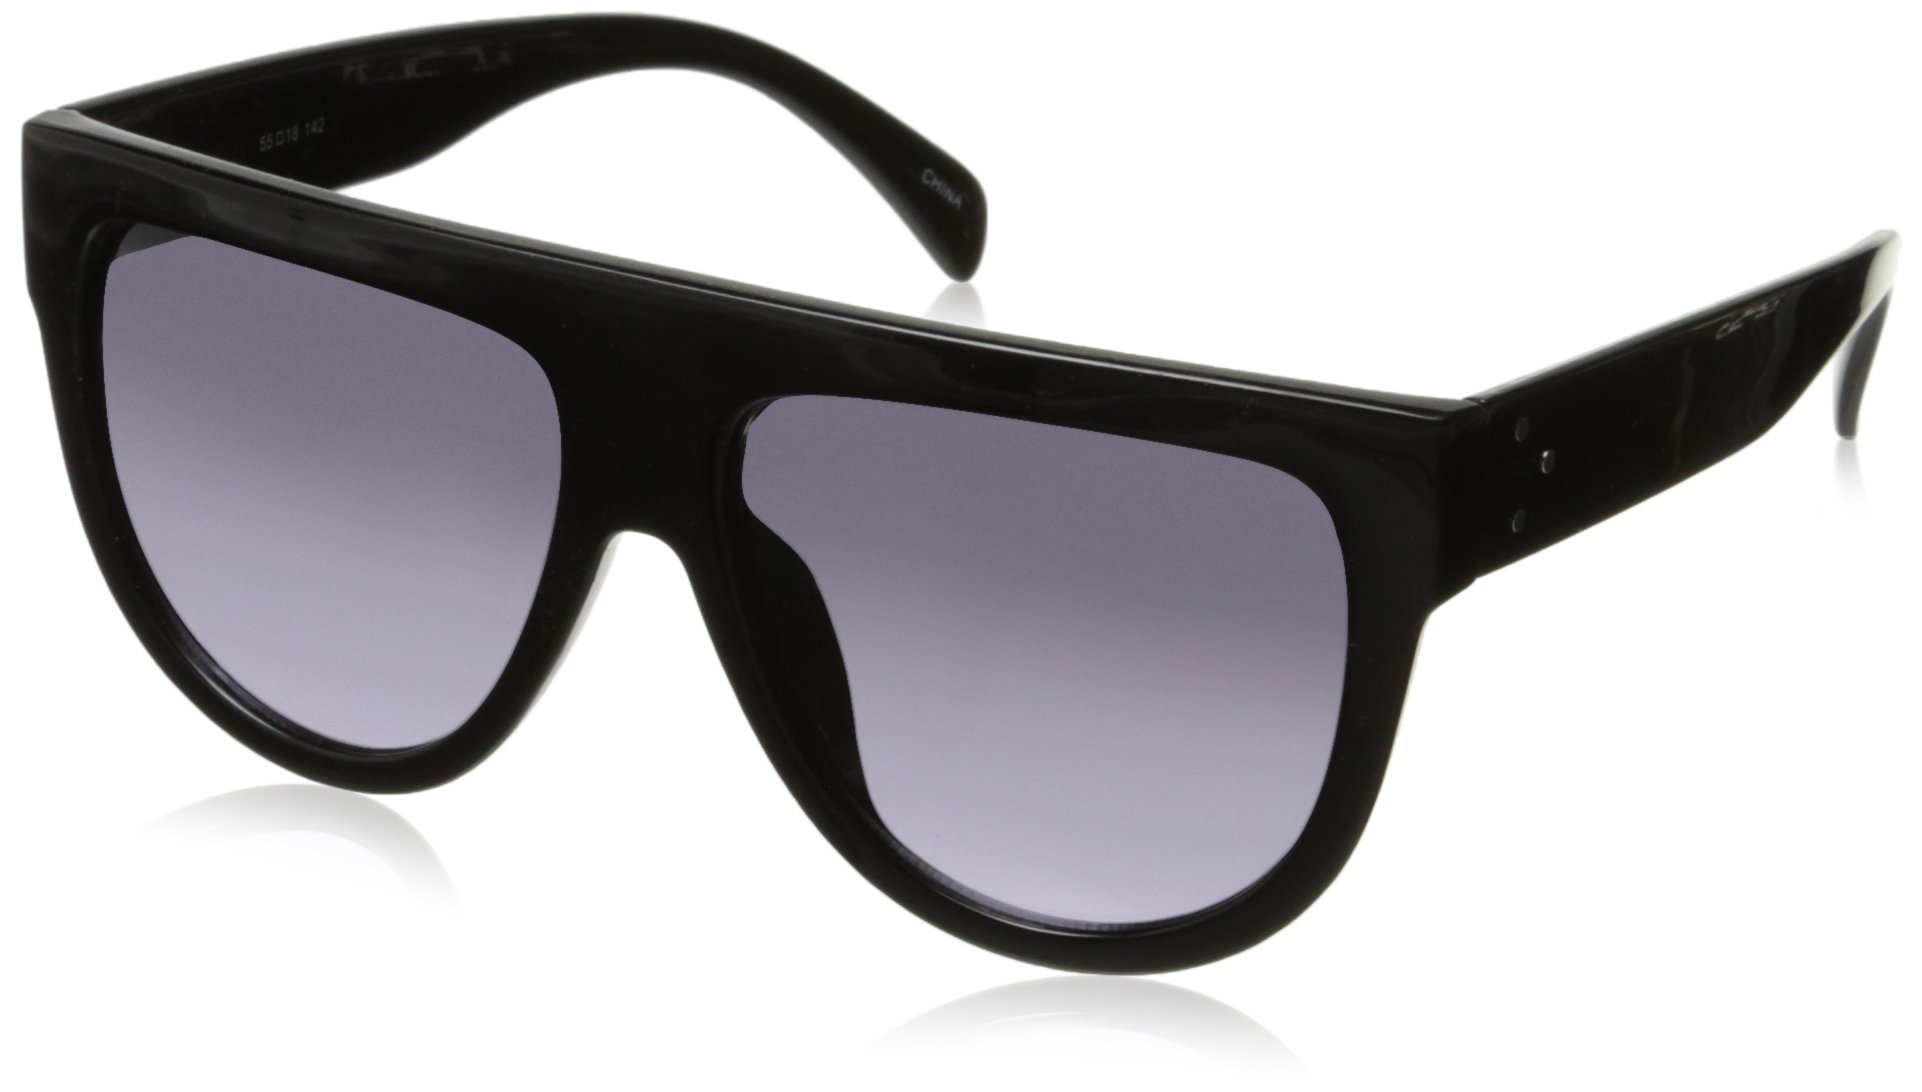 zeroUV Large Oversize Wide Temple Flat Top Aviator Sunglasses, Shiny Black/Lavender, 57 mm